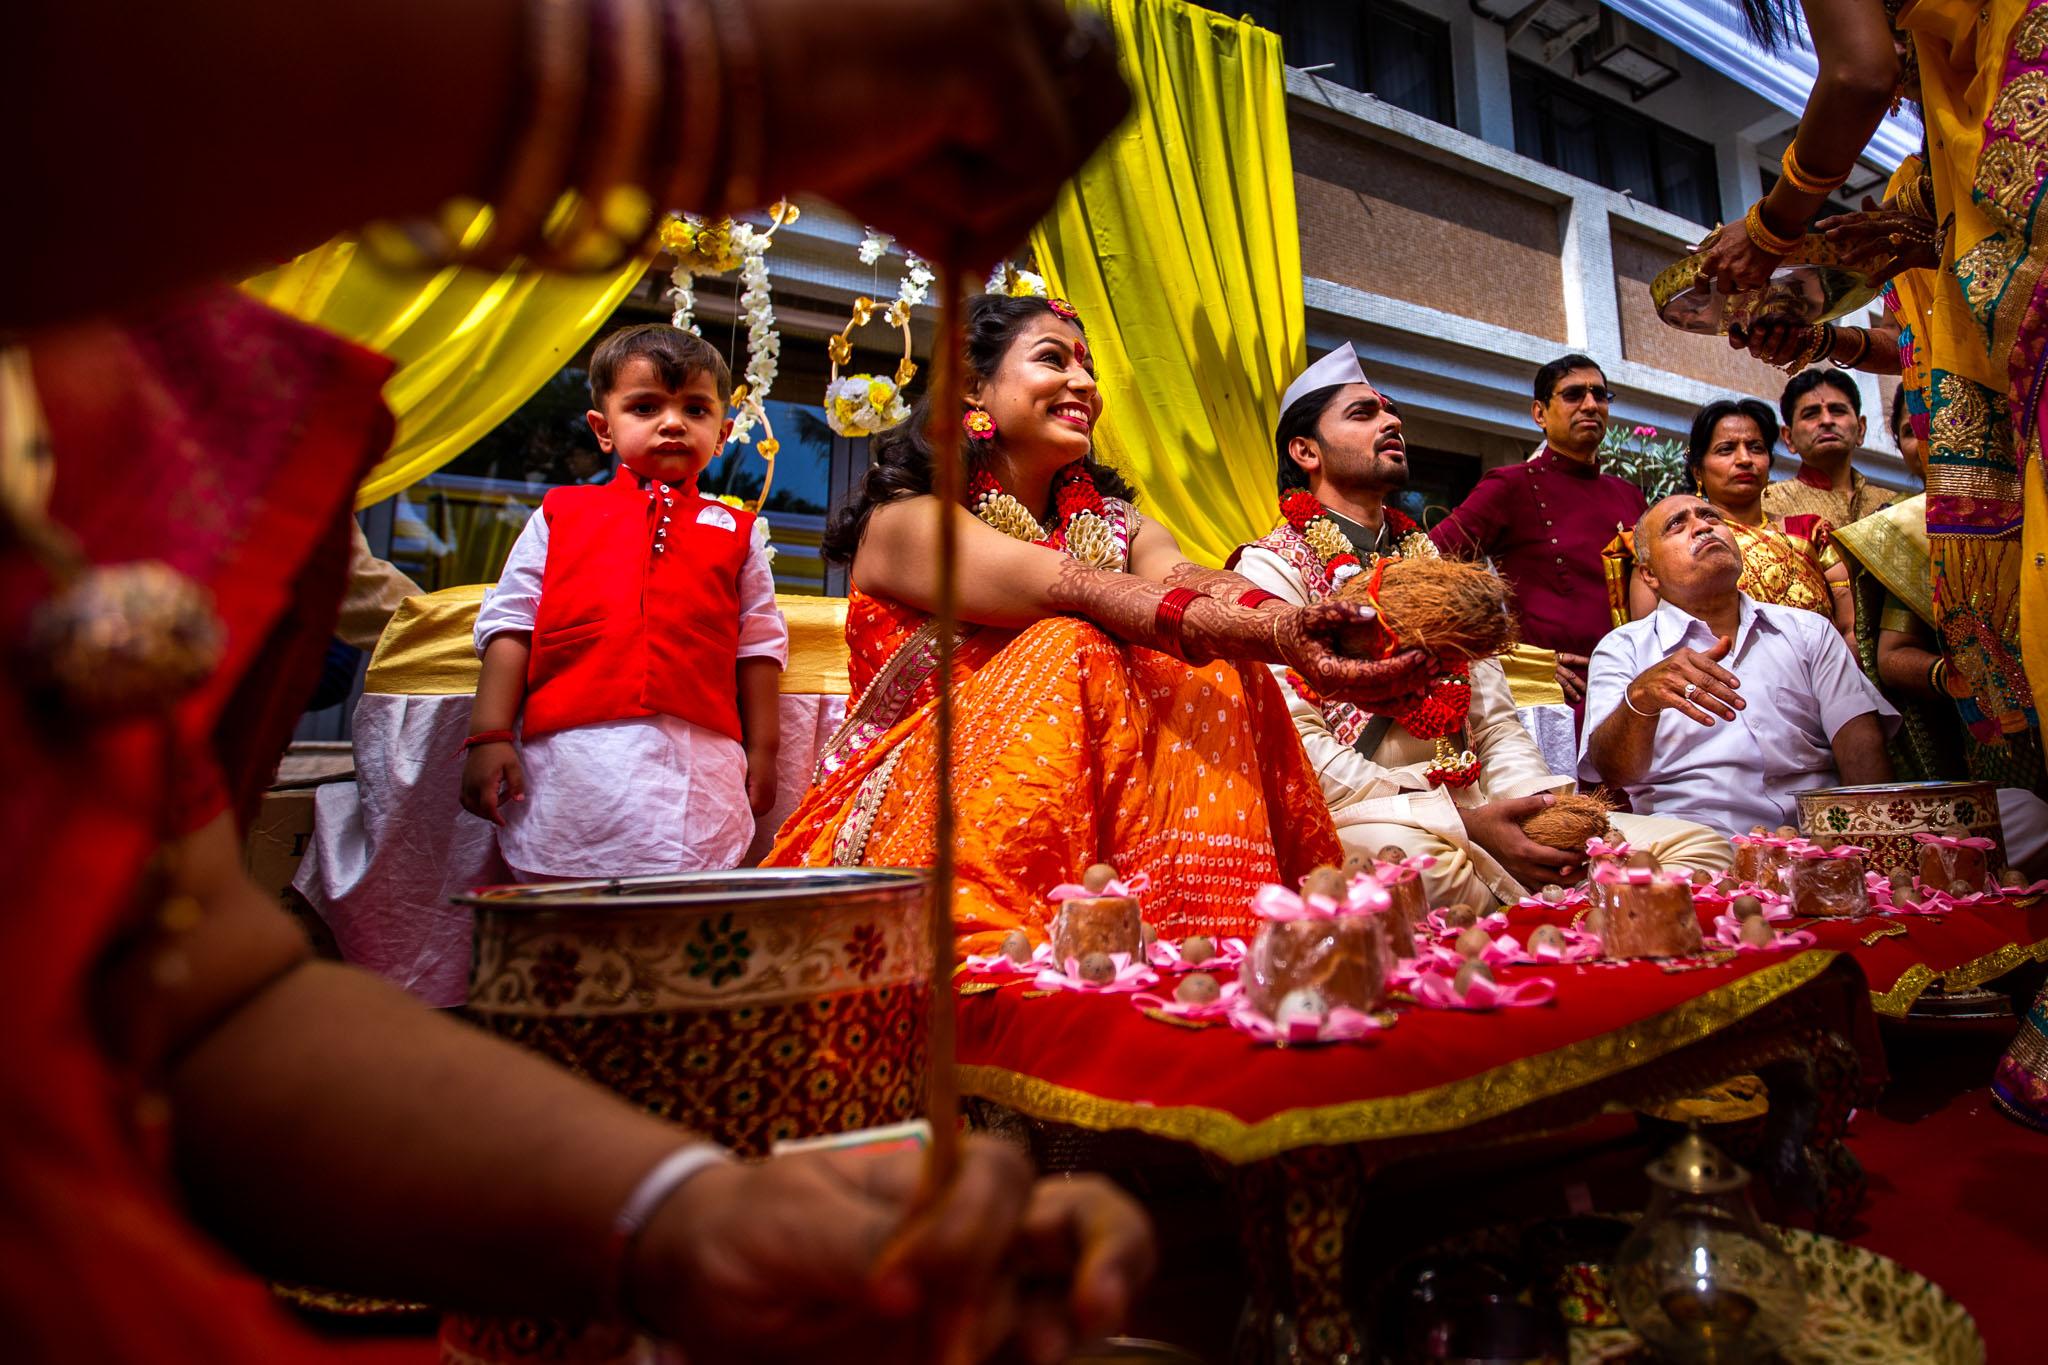 Mukti x Ojas Wedding Akshjay Sansare Photography Best wedding photographer in mumbai India Candid Cinematic Films videos-9.jpg